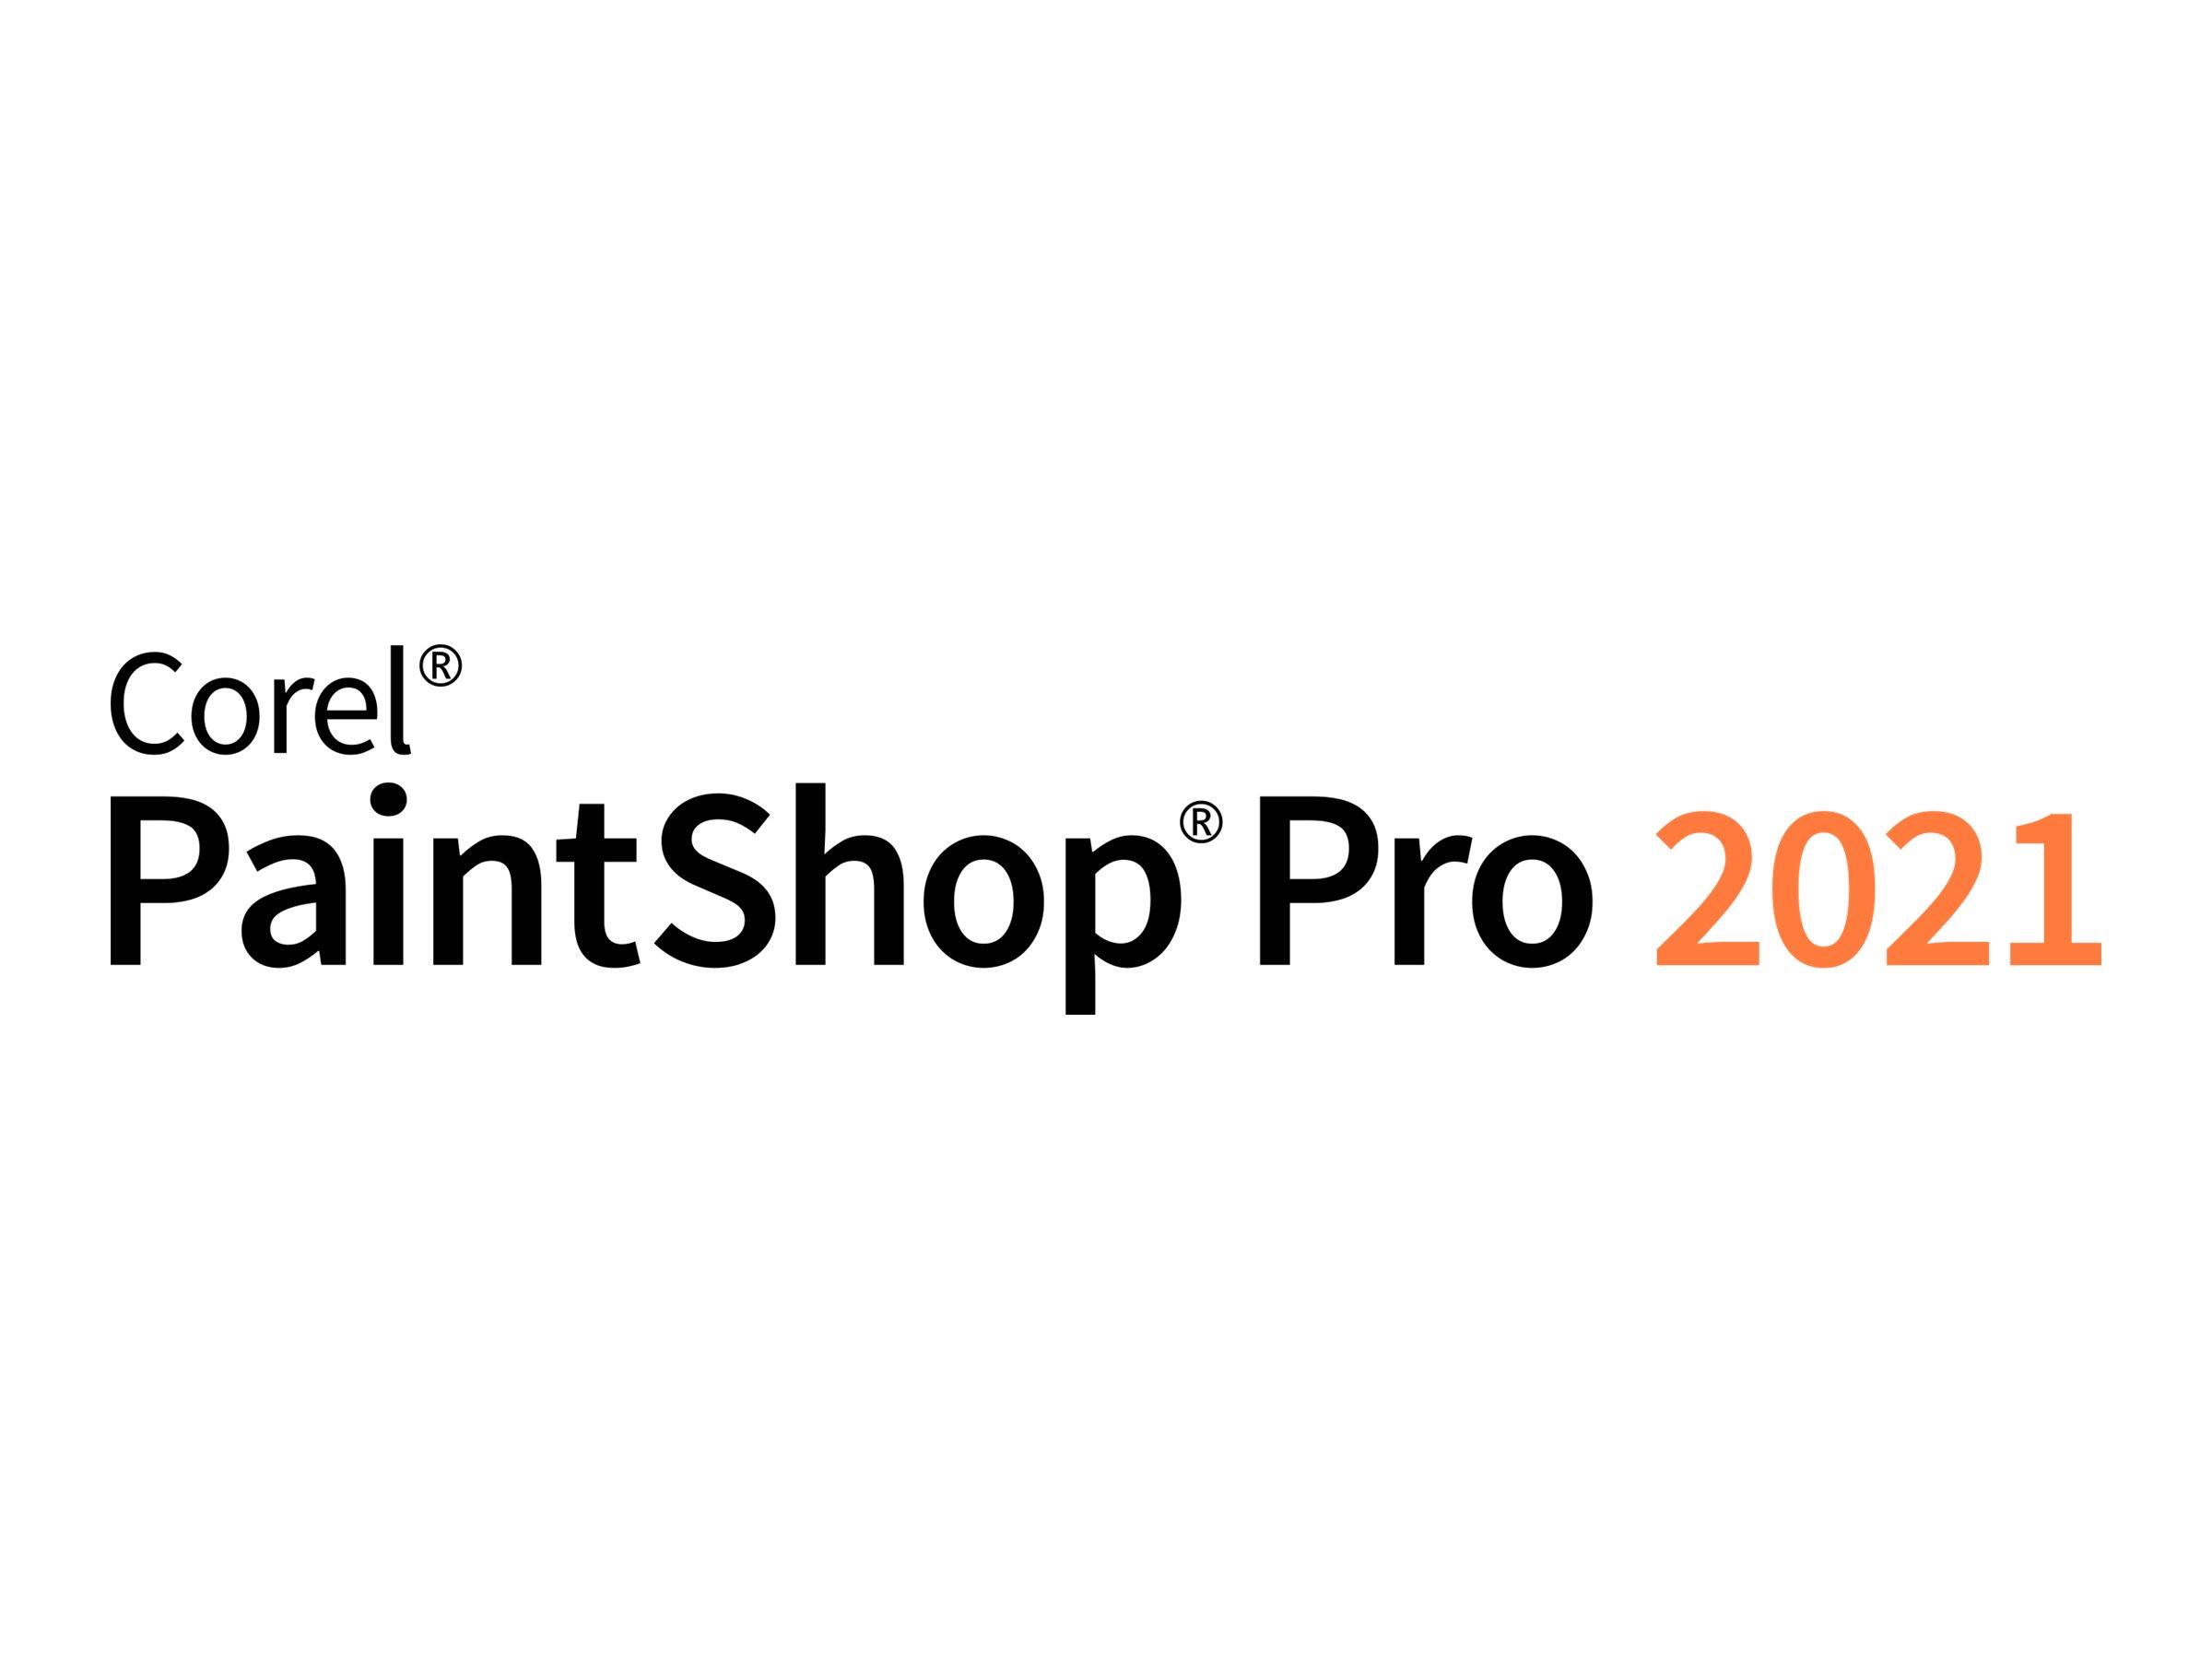 Corel PaintShop Pro 2021 - Upgrade-Lizenz - 1 Benutzer - Corporate / Unternehmens- - Win - Multi-Lingual